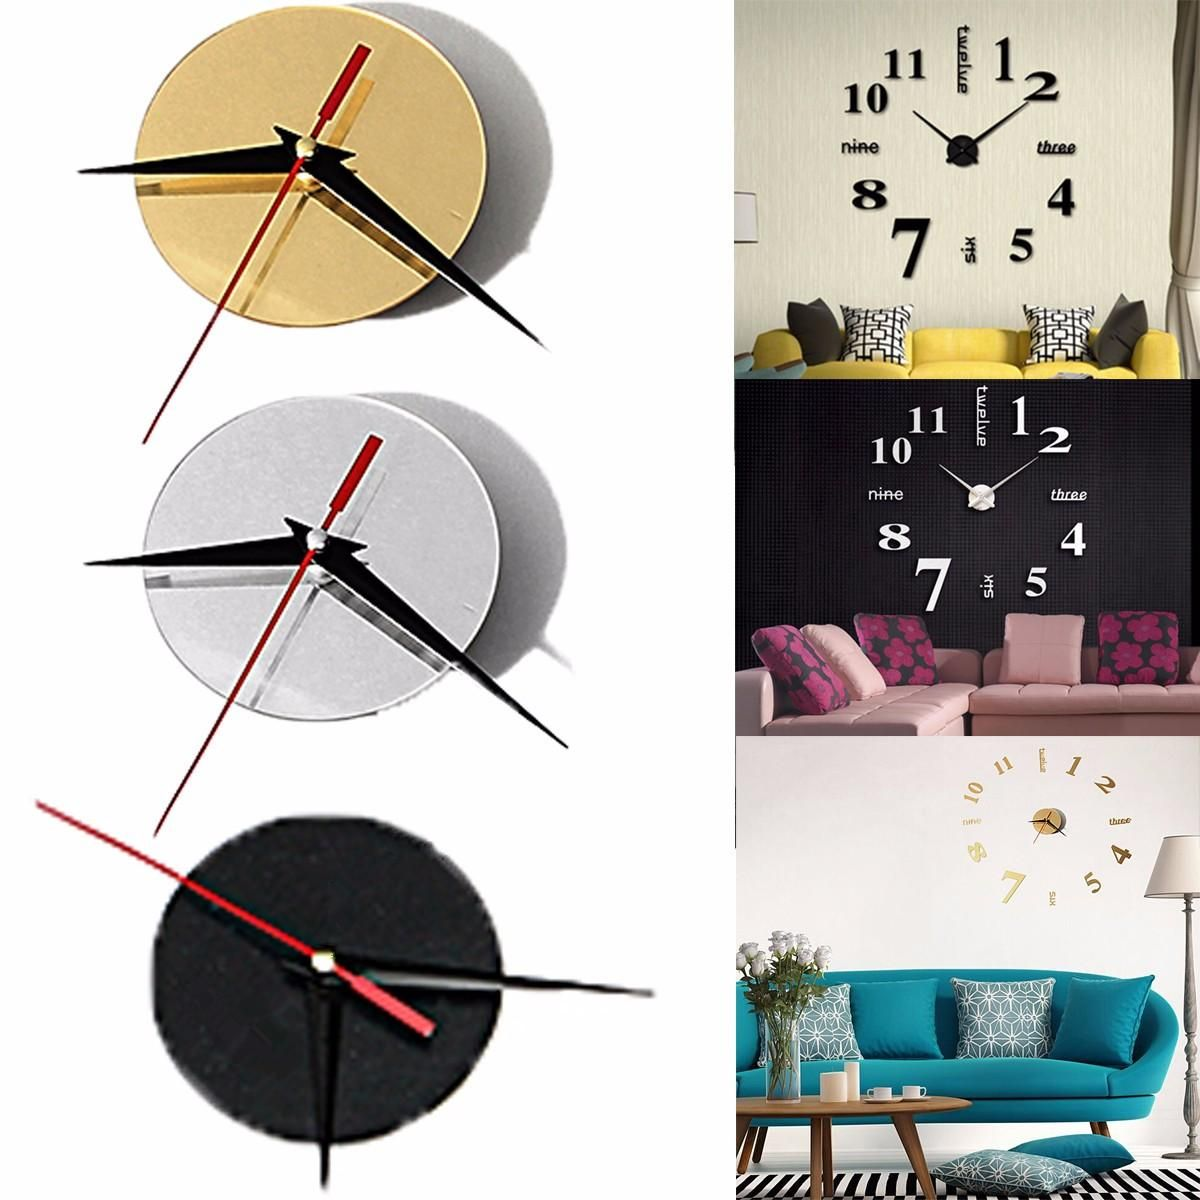 Large Quartz Wall Clock Movement Diy Hands Mechanism Repair Parts Tool Kit Smart Home From Consumer Electronics On Banggood Com In 2020 Diy Clock Wall Wall Clock Sticker Wall Clock